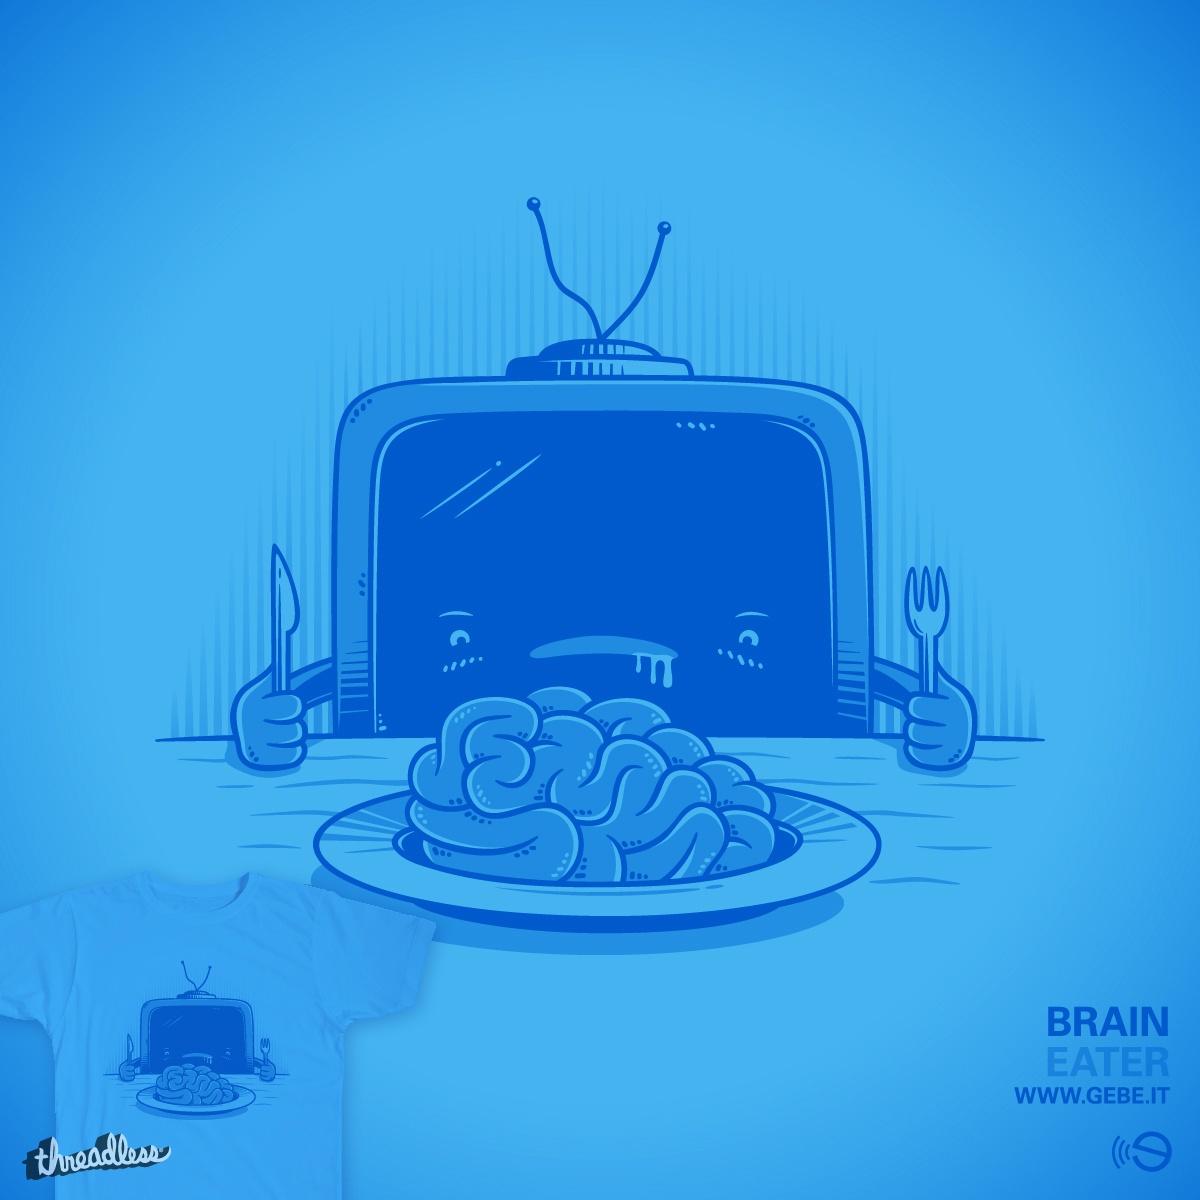 Brain eater by gebe on Threadless